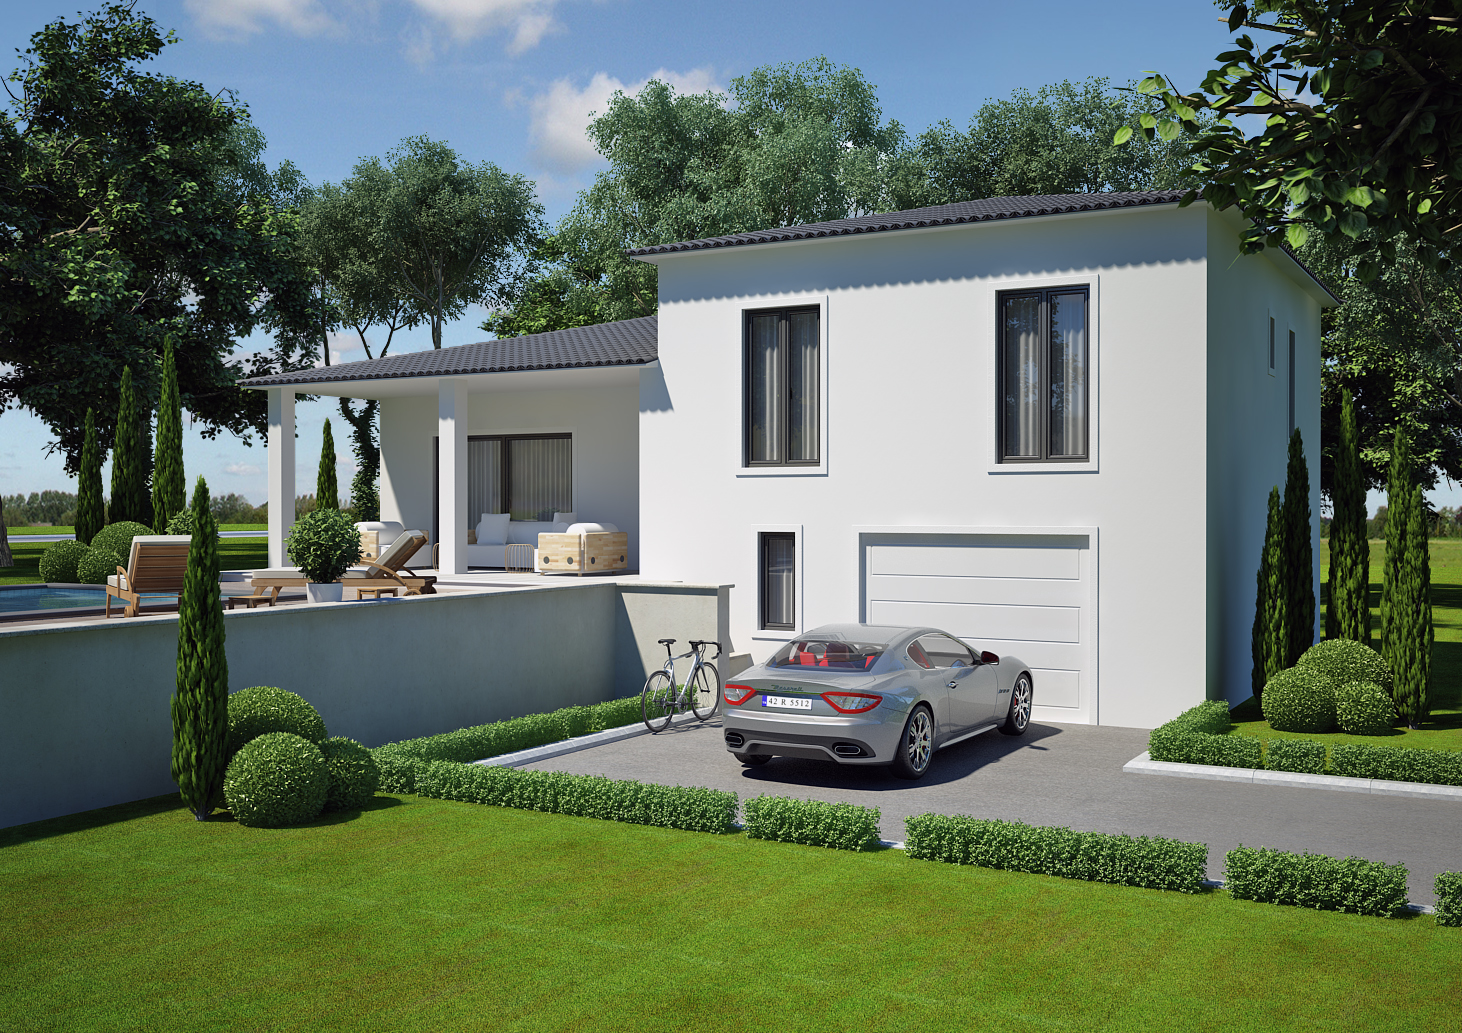 Modele maison 100m2 maison habitat concept inya agrandir for Modele maison habitat concept